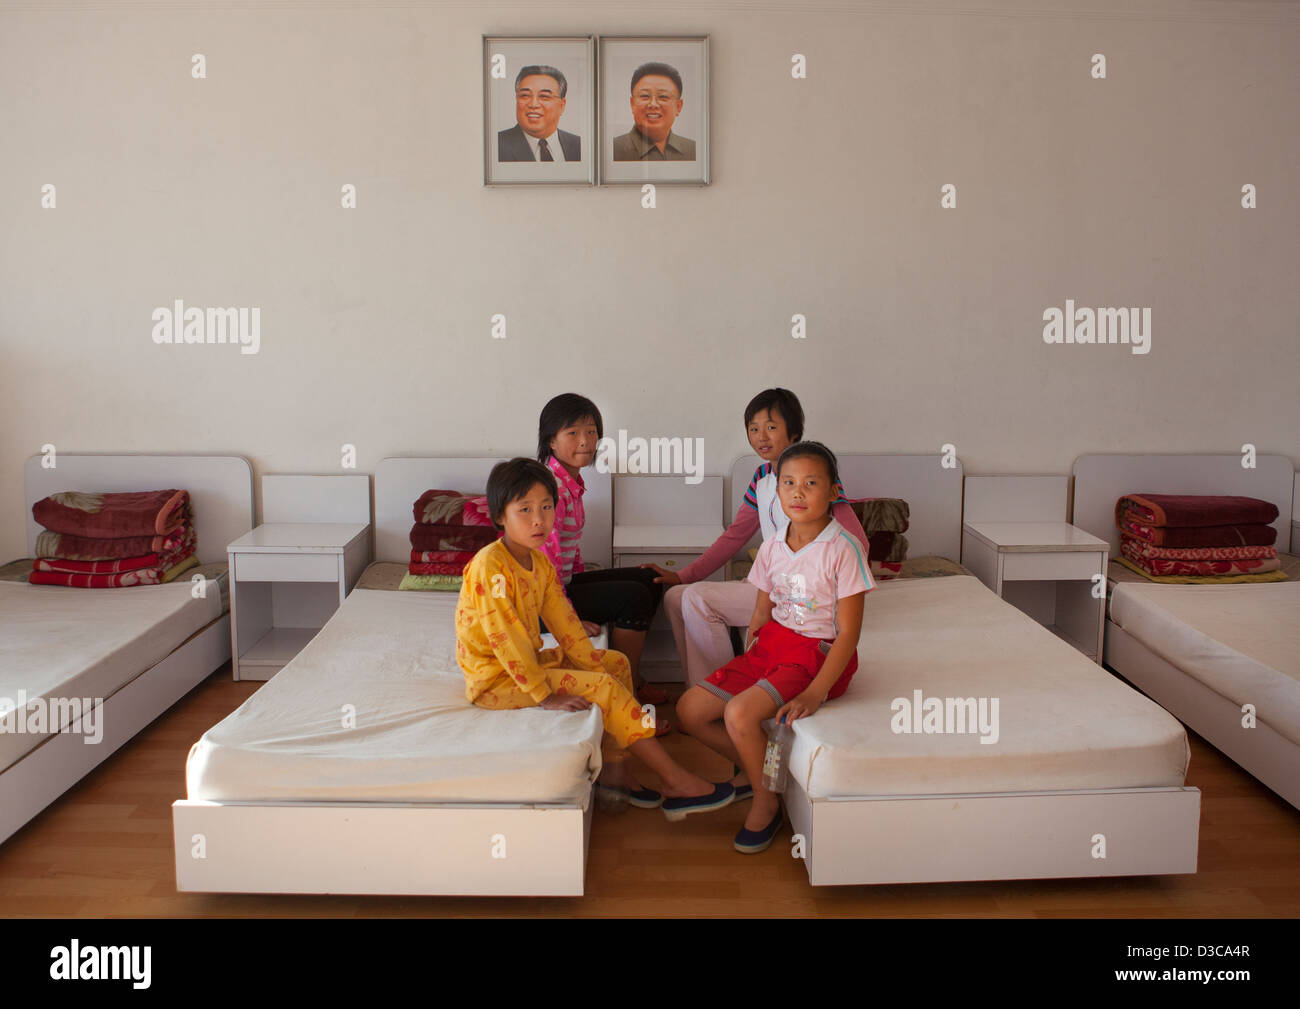 Kids In A Room Of Songdowon International Children's Camp, Wonsan, North Korea, North Korea - Stock Image